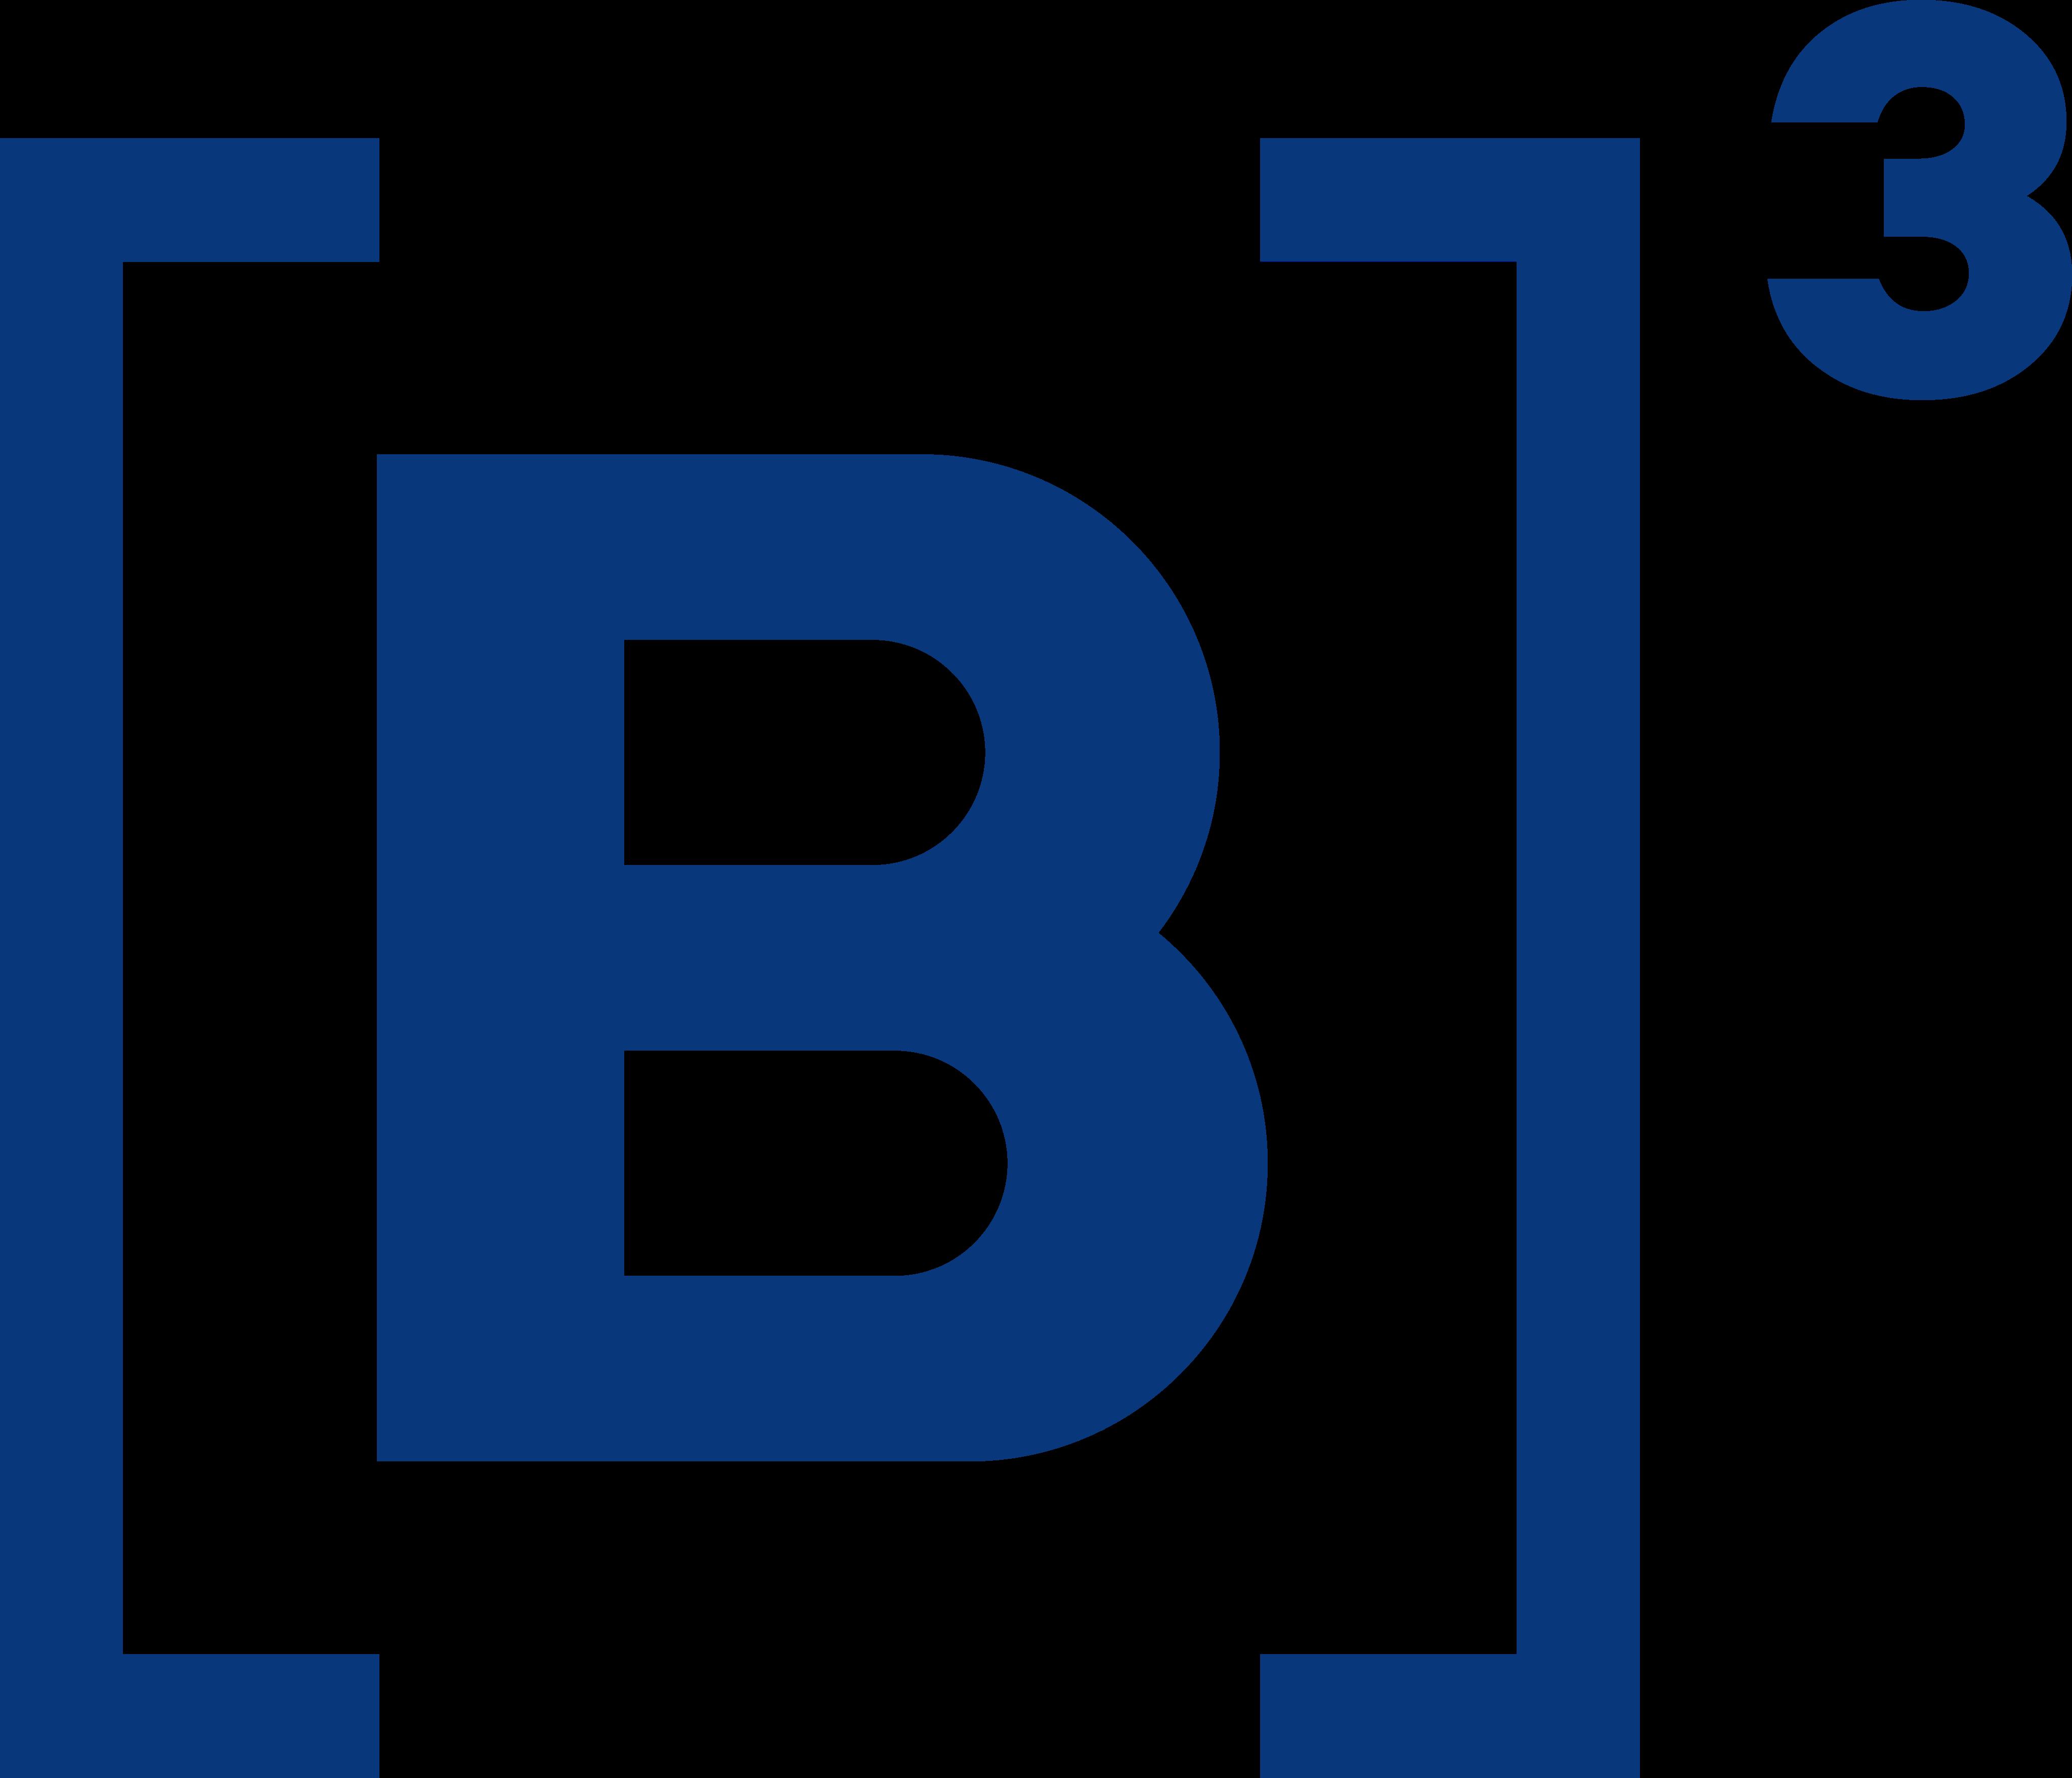 b3 logo.